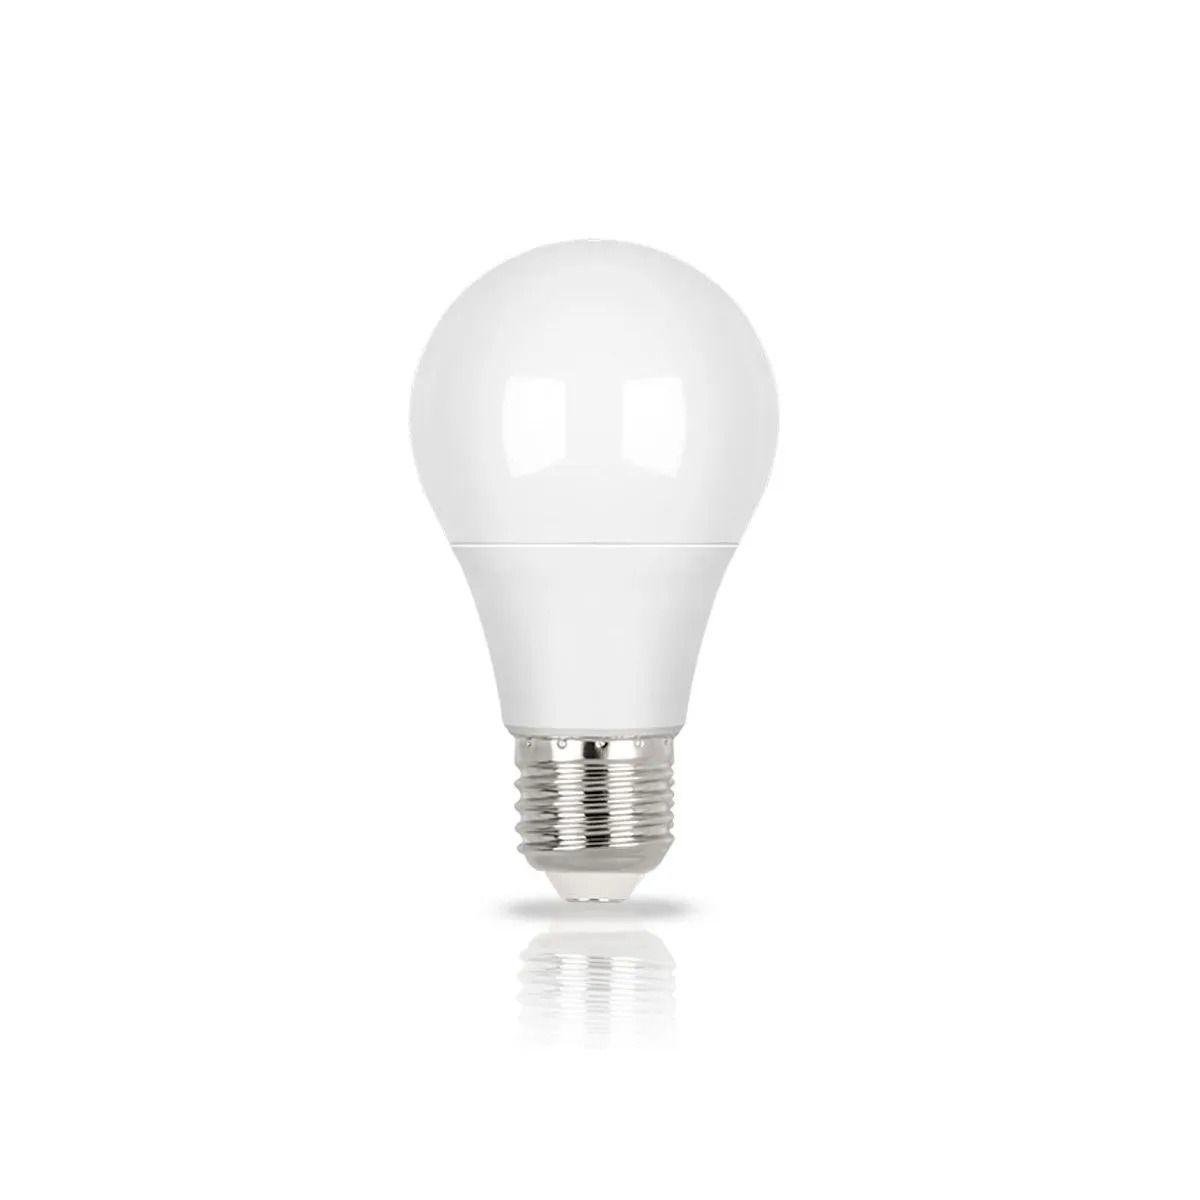 Lâmpada LED Bulbo A60 9W 3000K Bivolt Stella - STH8265/30